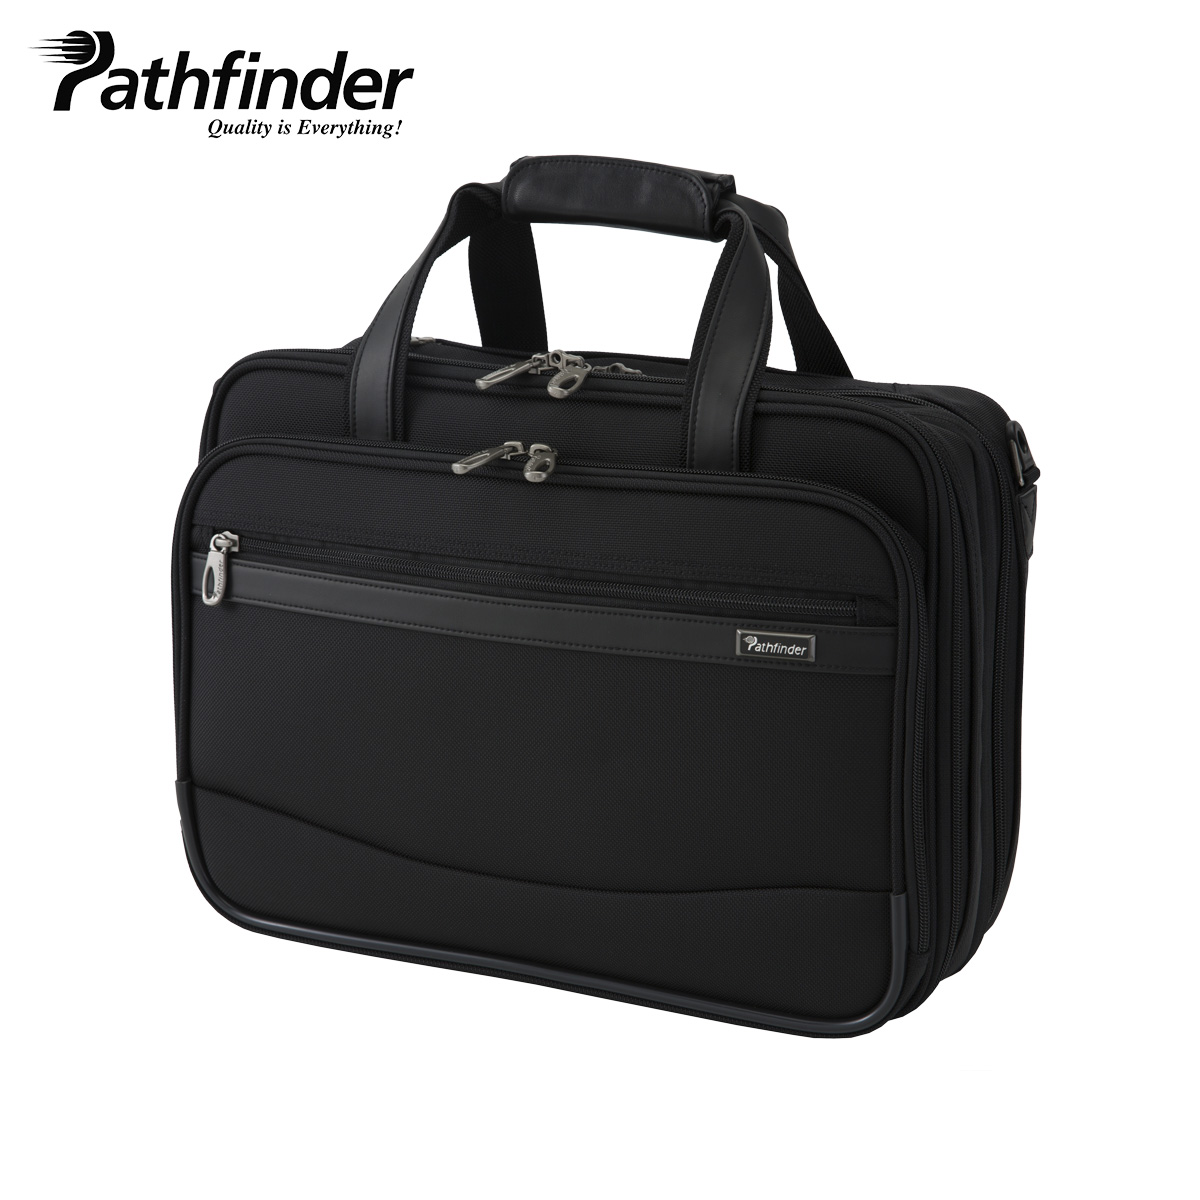 Pathfinder REVOLUTION XT パスファインダー バッグ ビジネスバッグ ブリーフケース ショルダー メンズ ブラック 黒 PF6805B